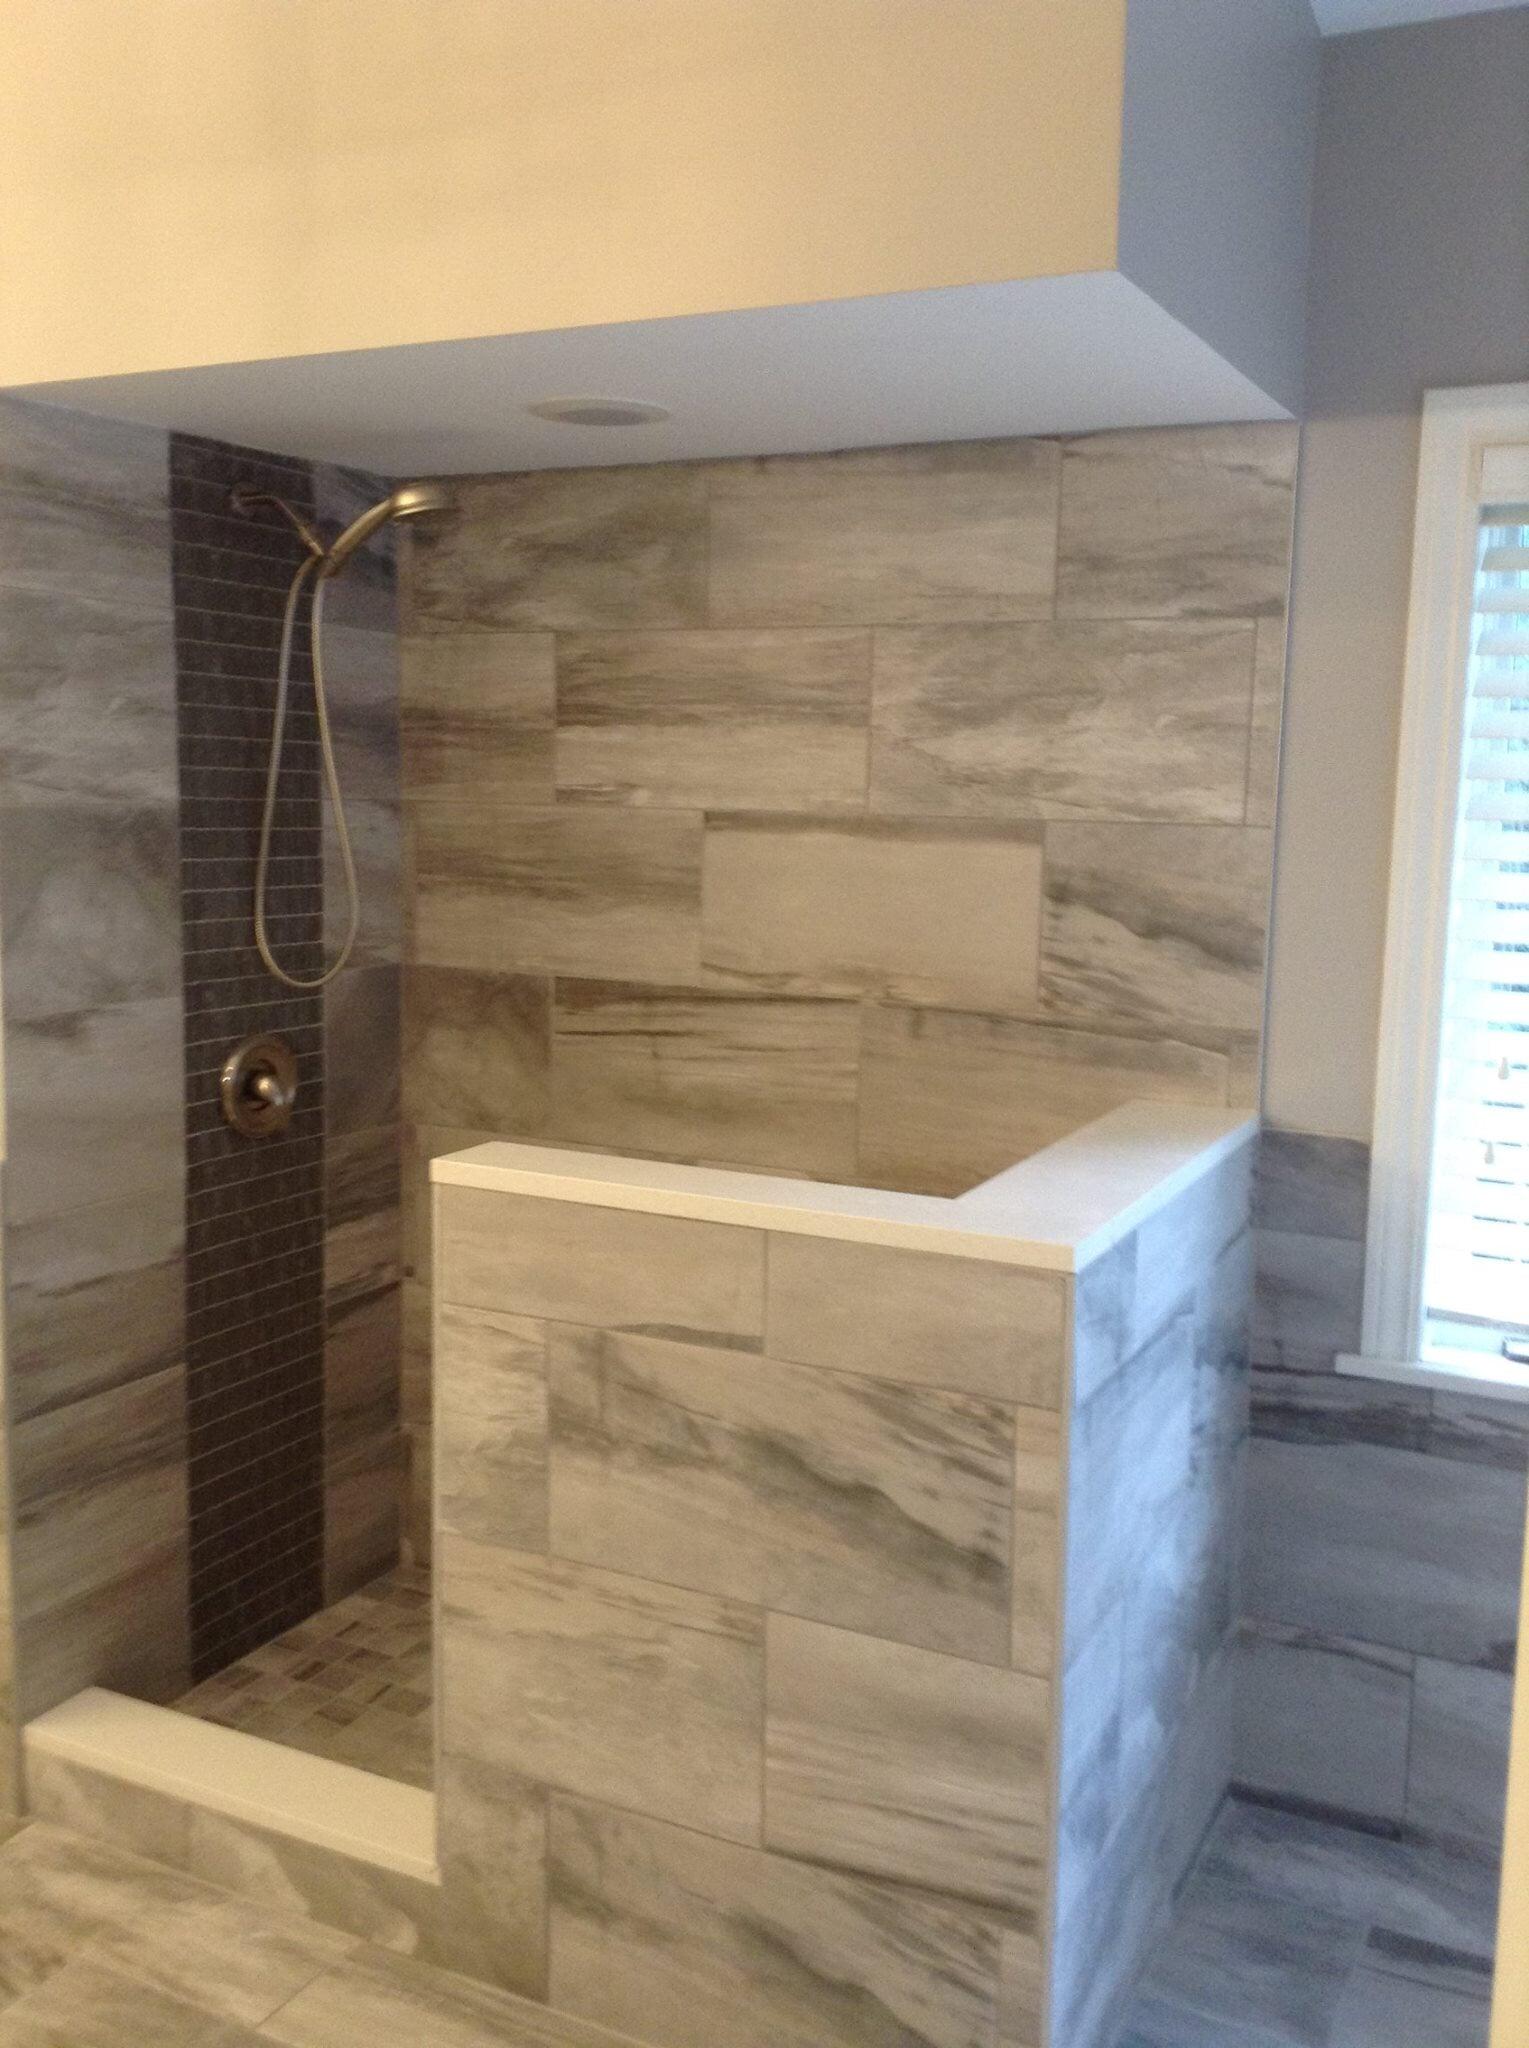 Bathroom Tile Installation- Wall and Floor Tile